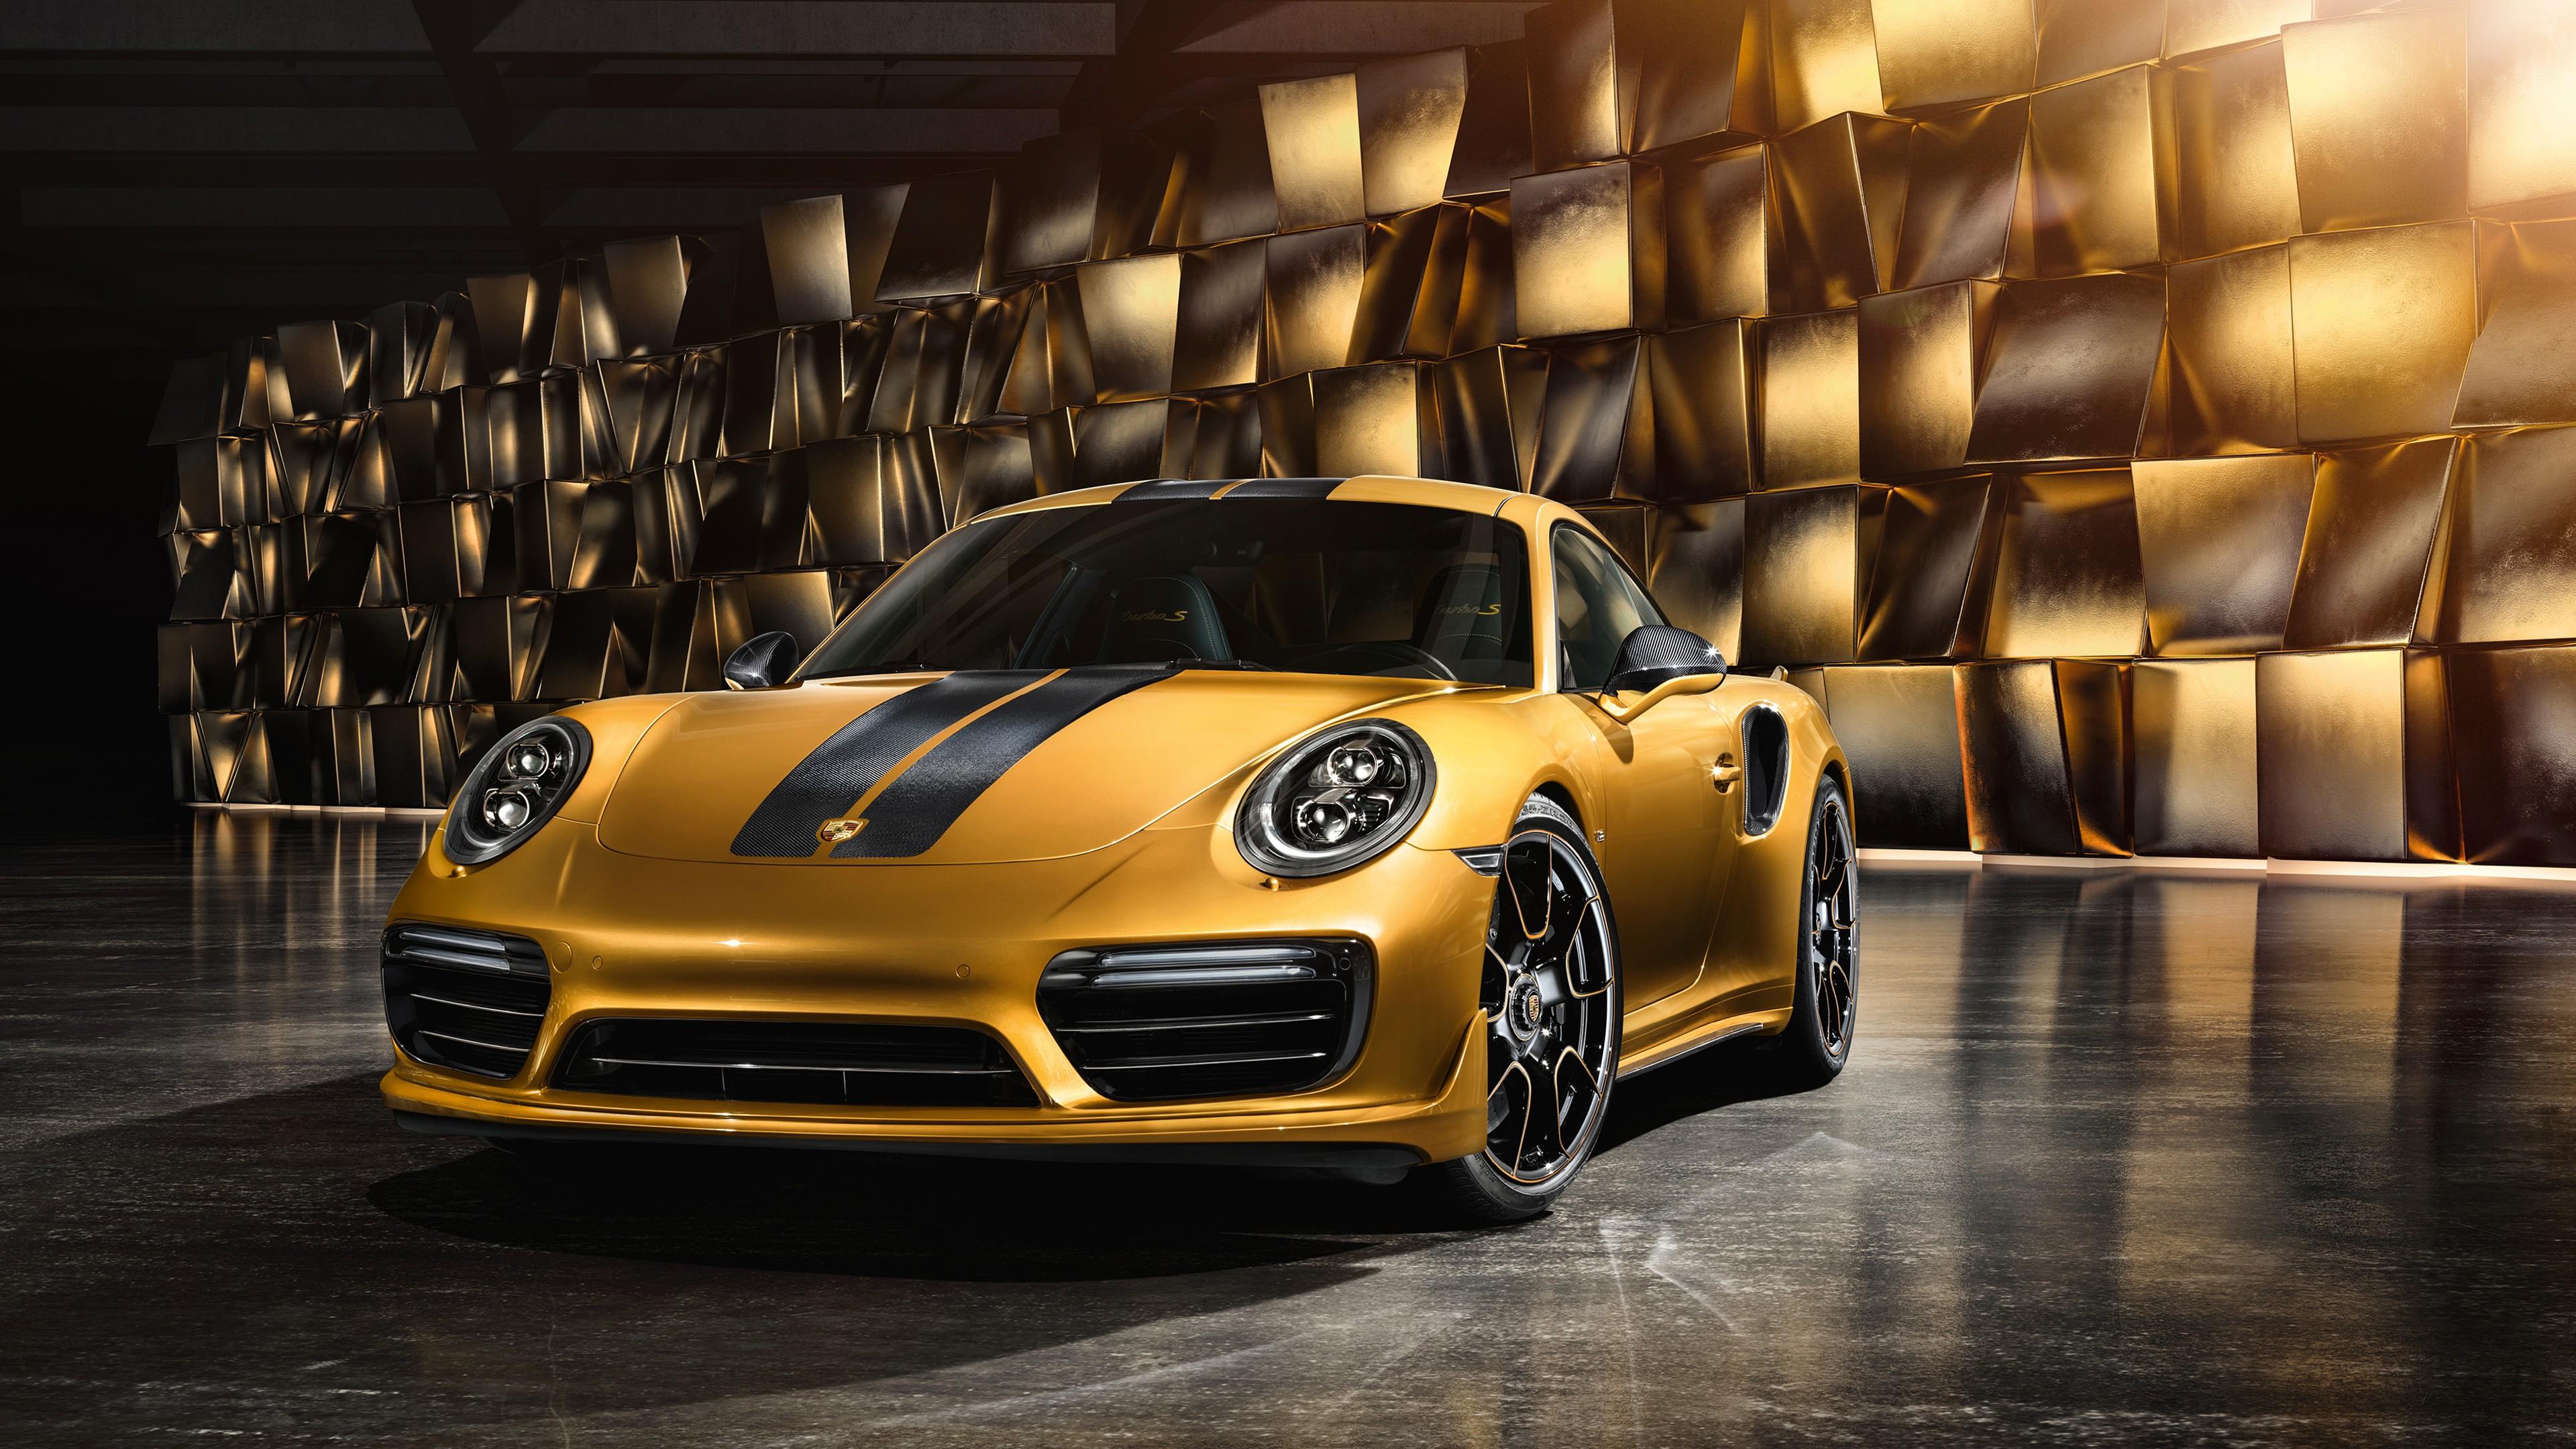 Hd 3d Wallpapers 1080p Widescreen Windows 7 2017 Porsche 911 Turbo S Exclusive Series Wallpapers Hd